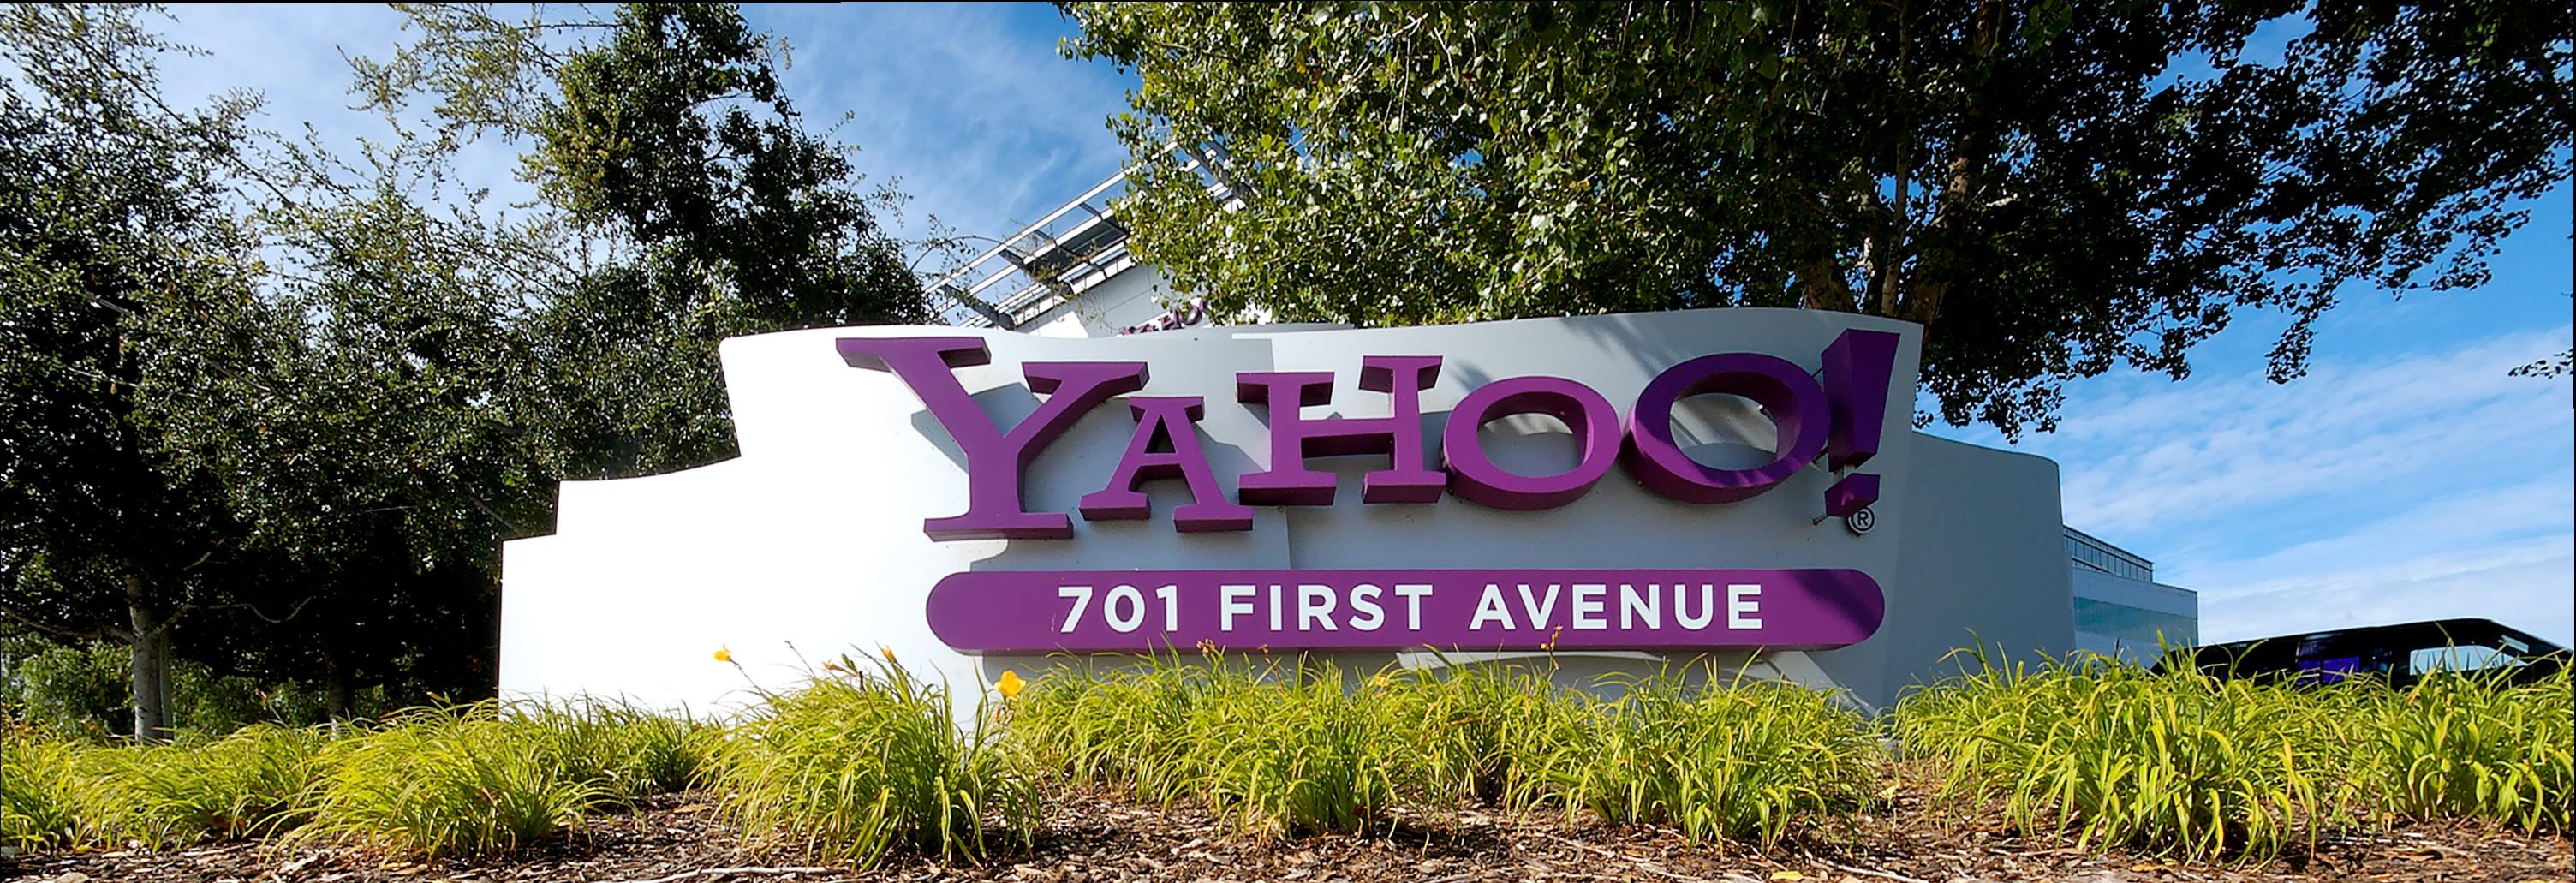 http://upload.wikimedia.org/wikipedia/commons/f/f2/Yahoo_701_First_Avenue.jpg